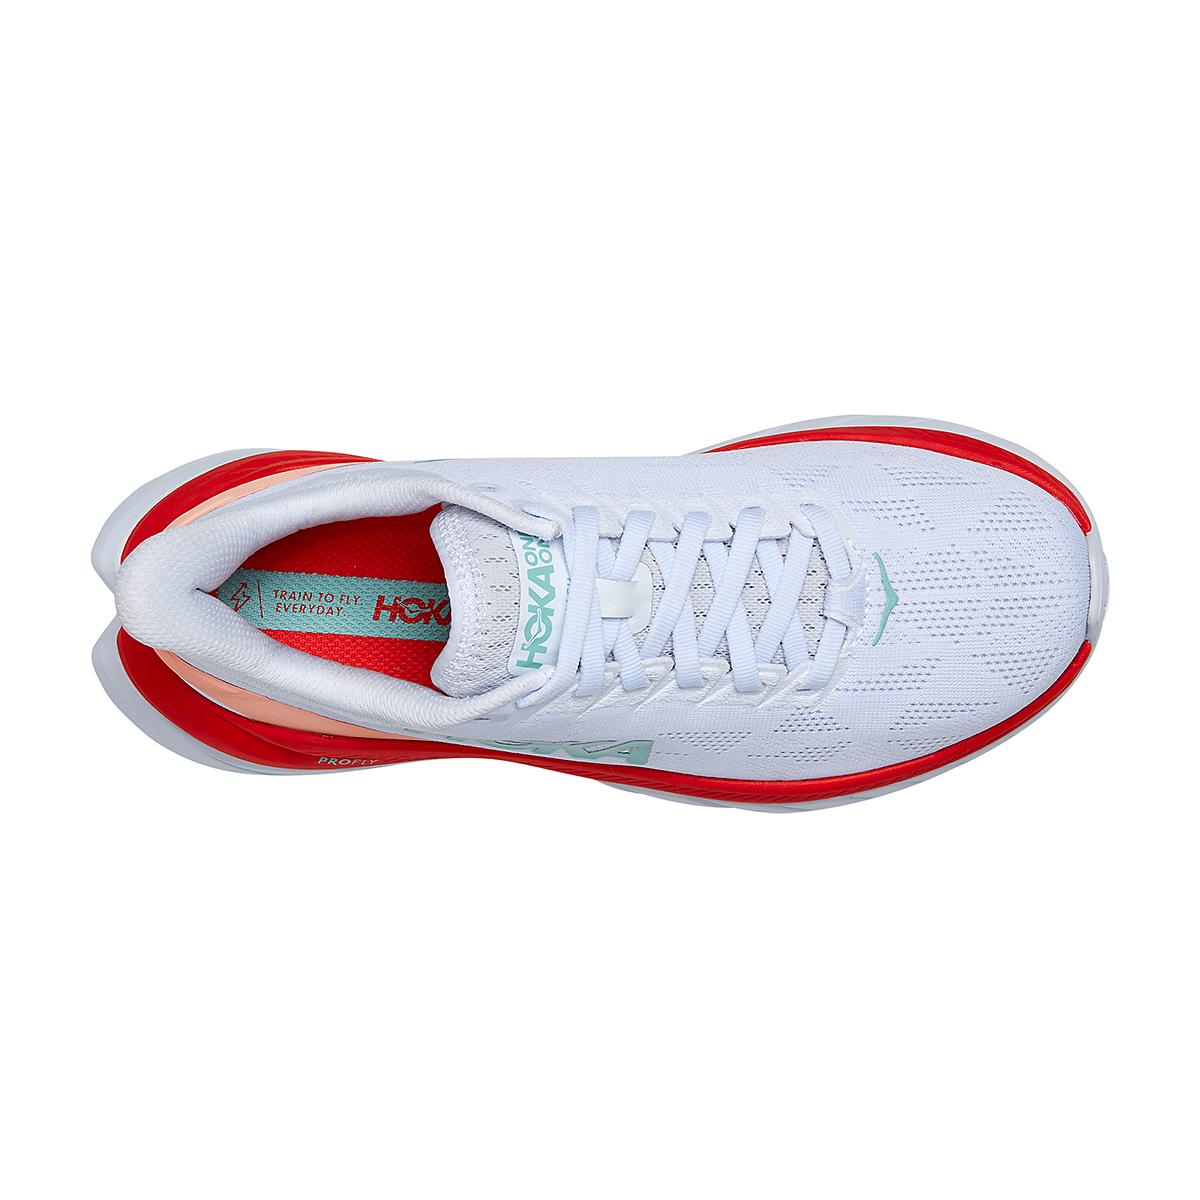 Women's Hoka One One Mach 4 Running Shoe - Color: White/Fiesta - Size: 5 - Width: Regular, White/Fiesta, large, image 5